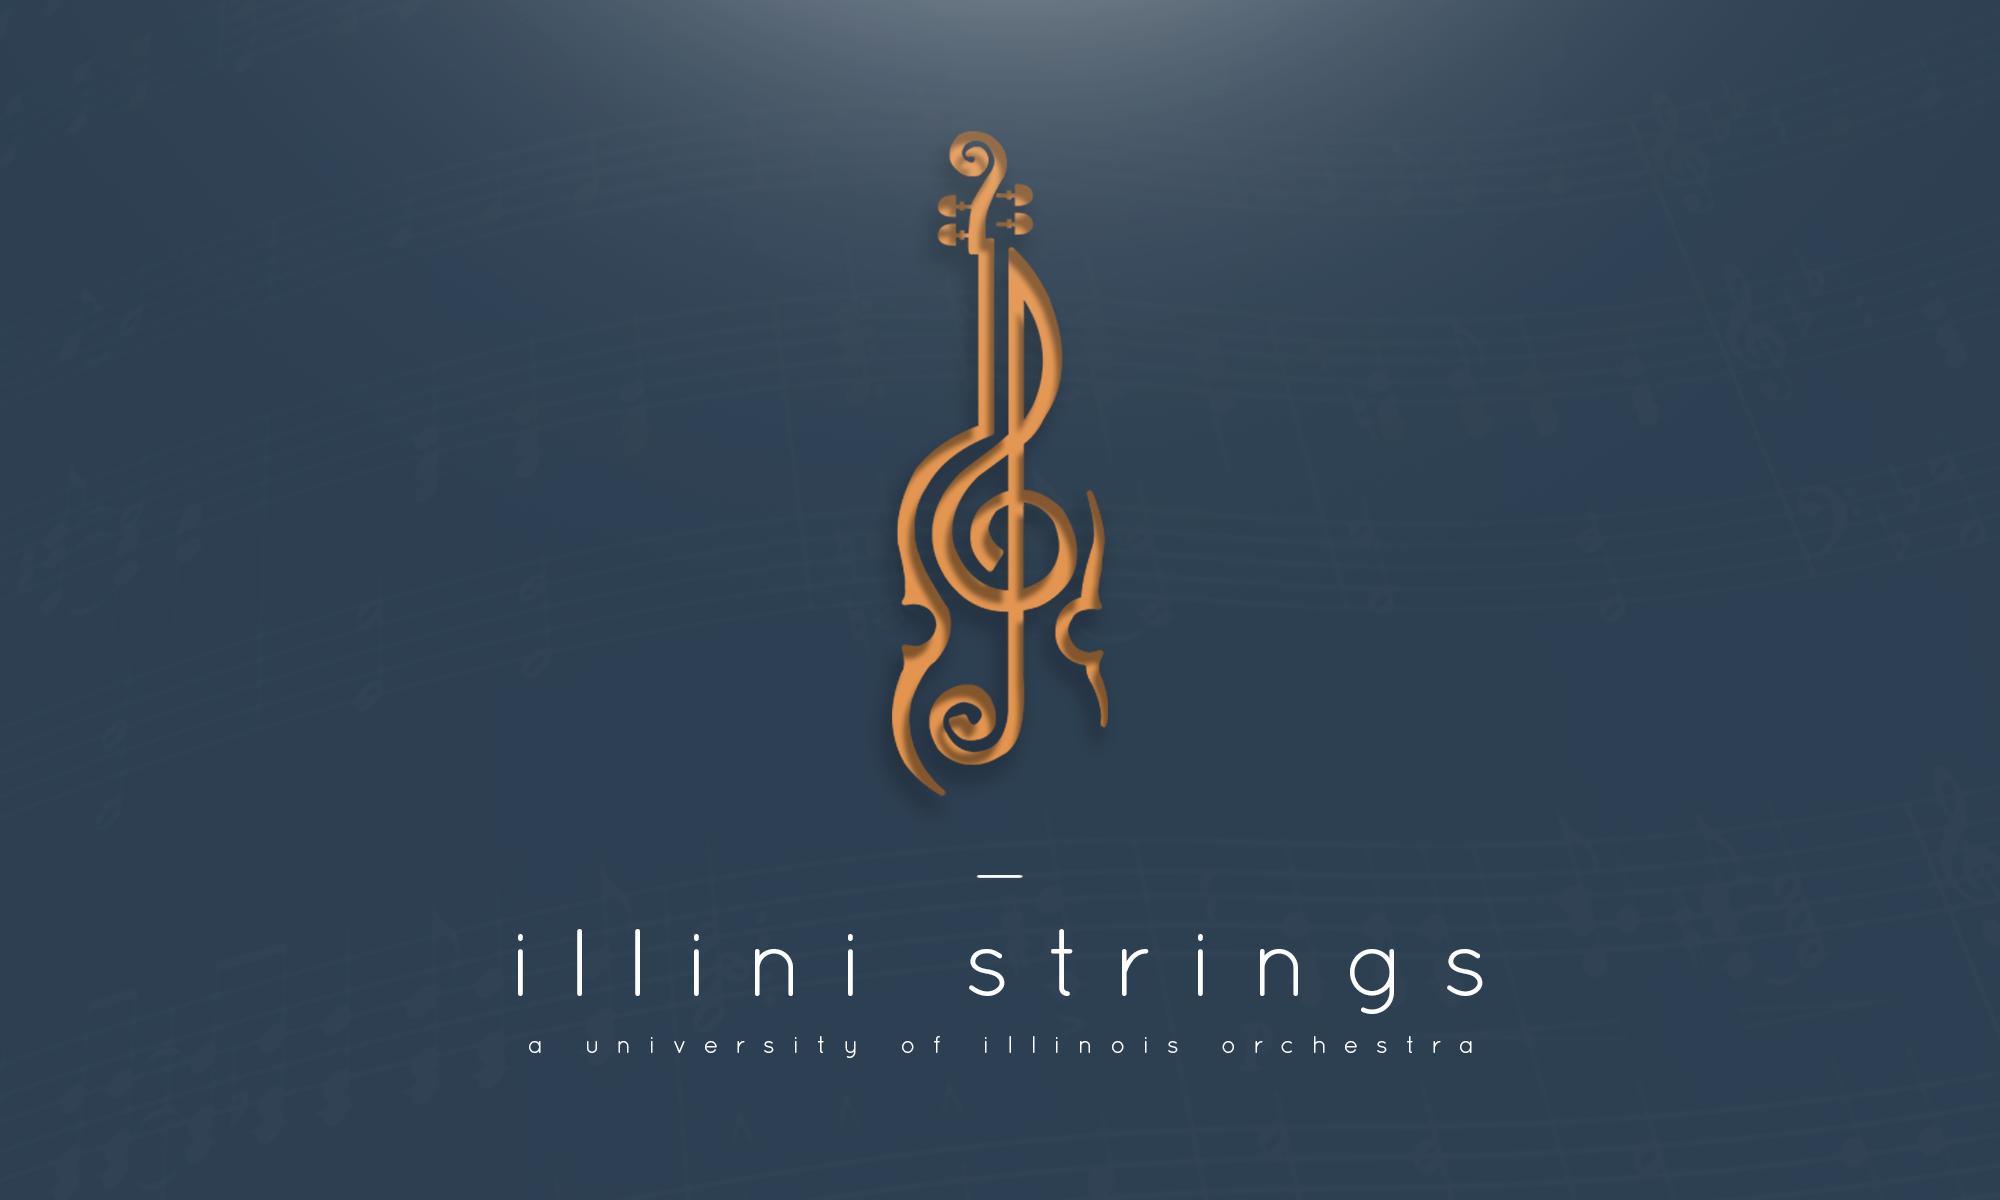 Illini Strings